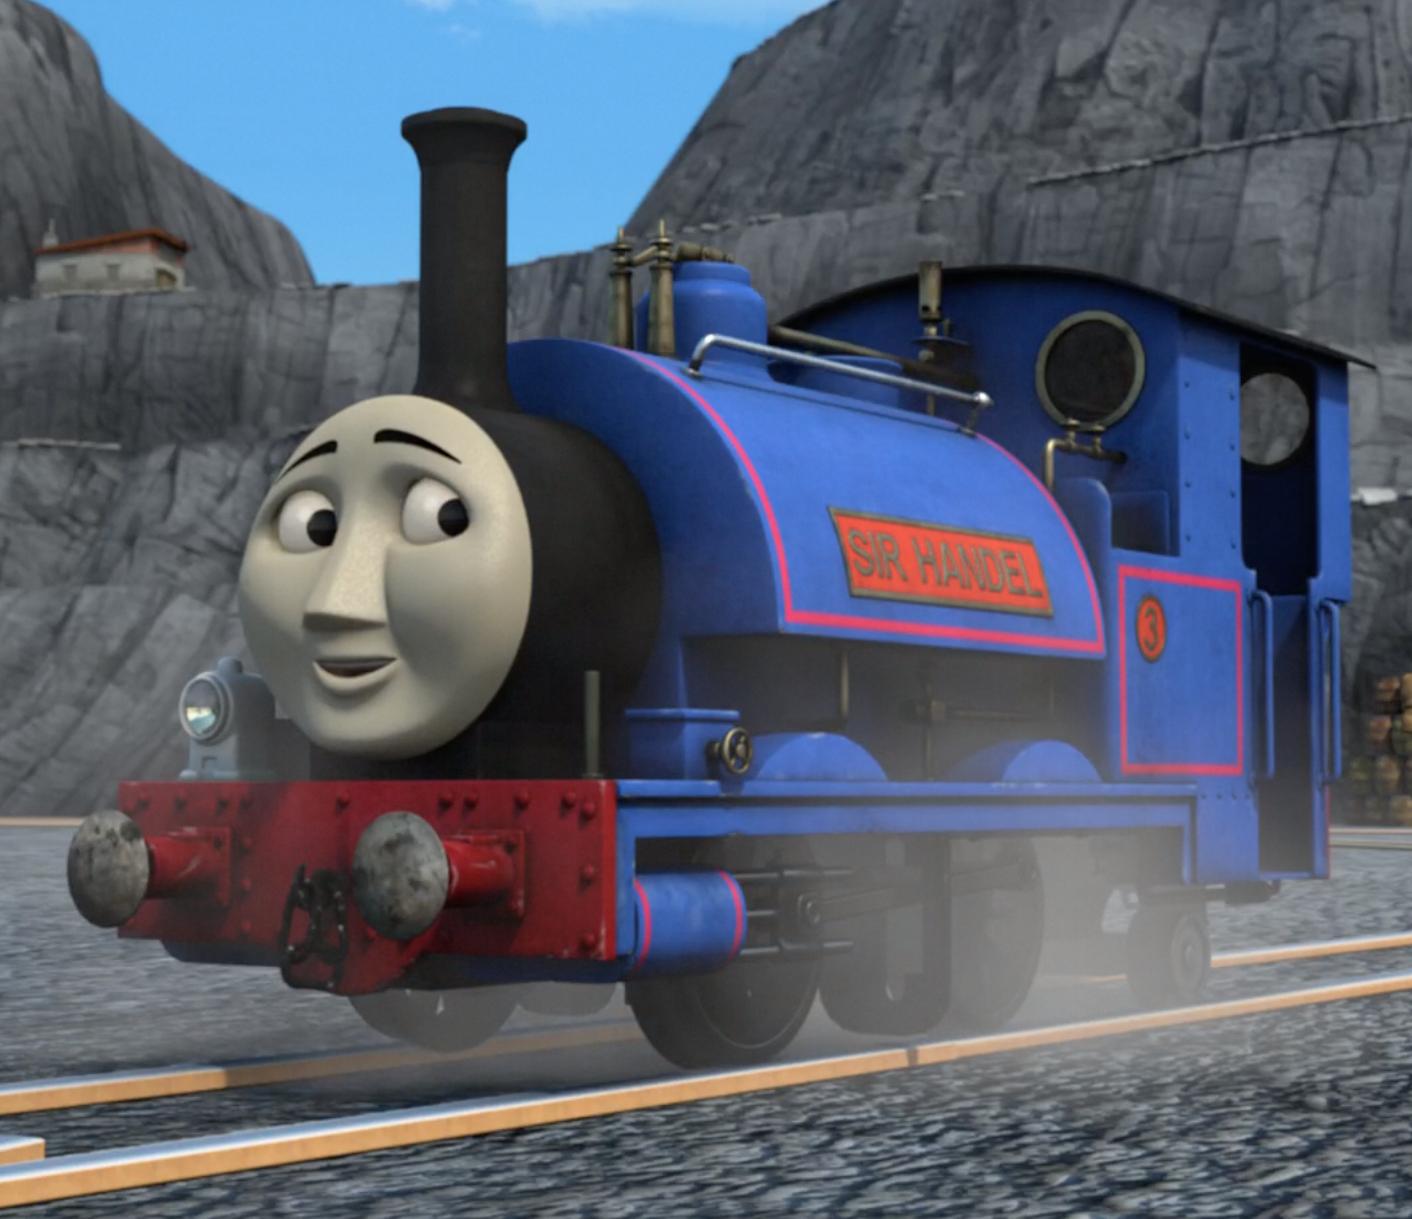 Sir Handel Thomas The Tank Engine Wikia Fandom Powered